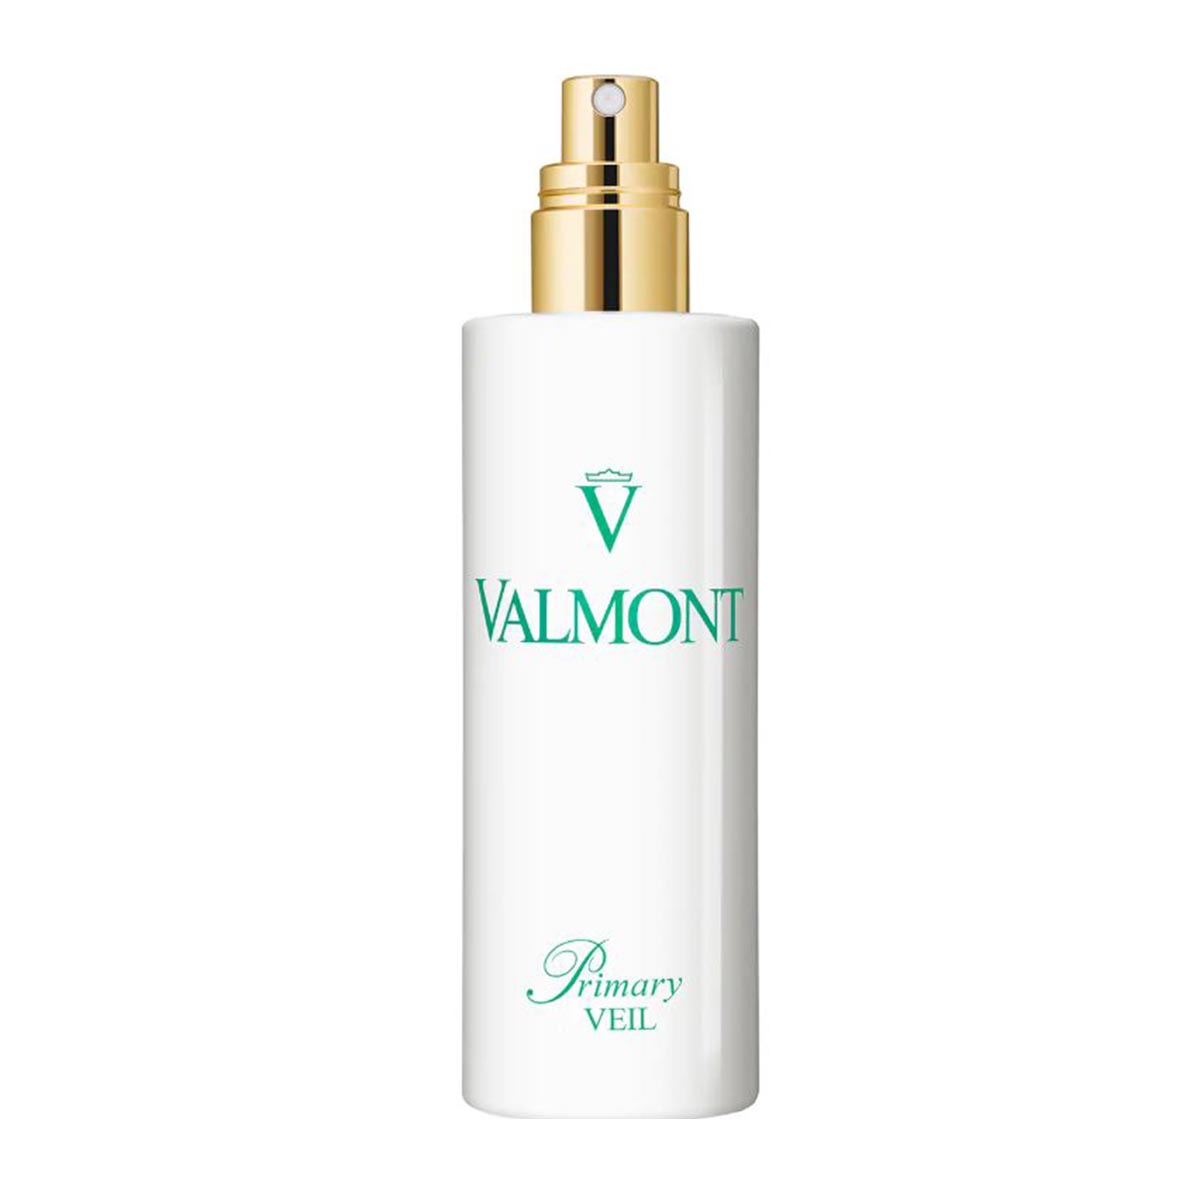 Valmont primary veil 150ml - BellezaMagica.com